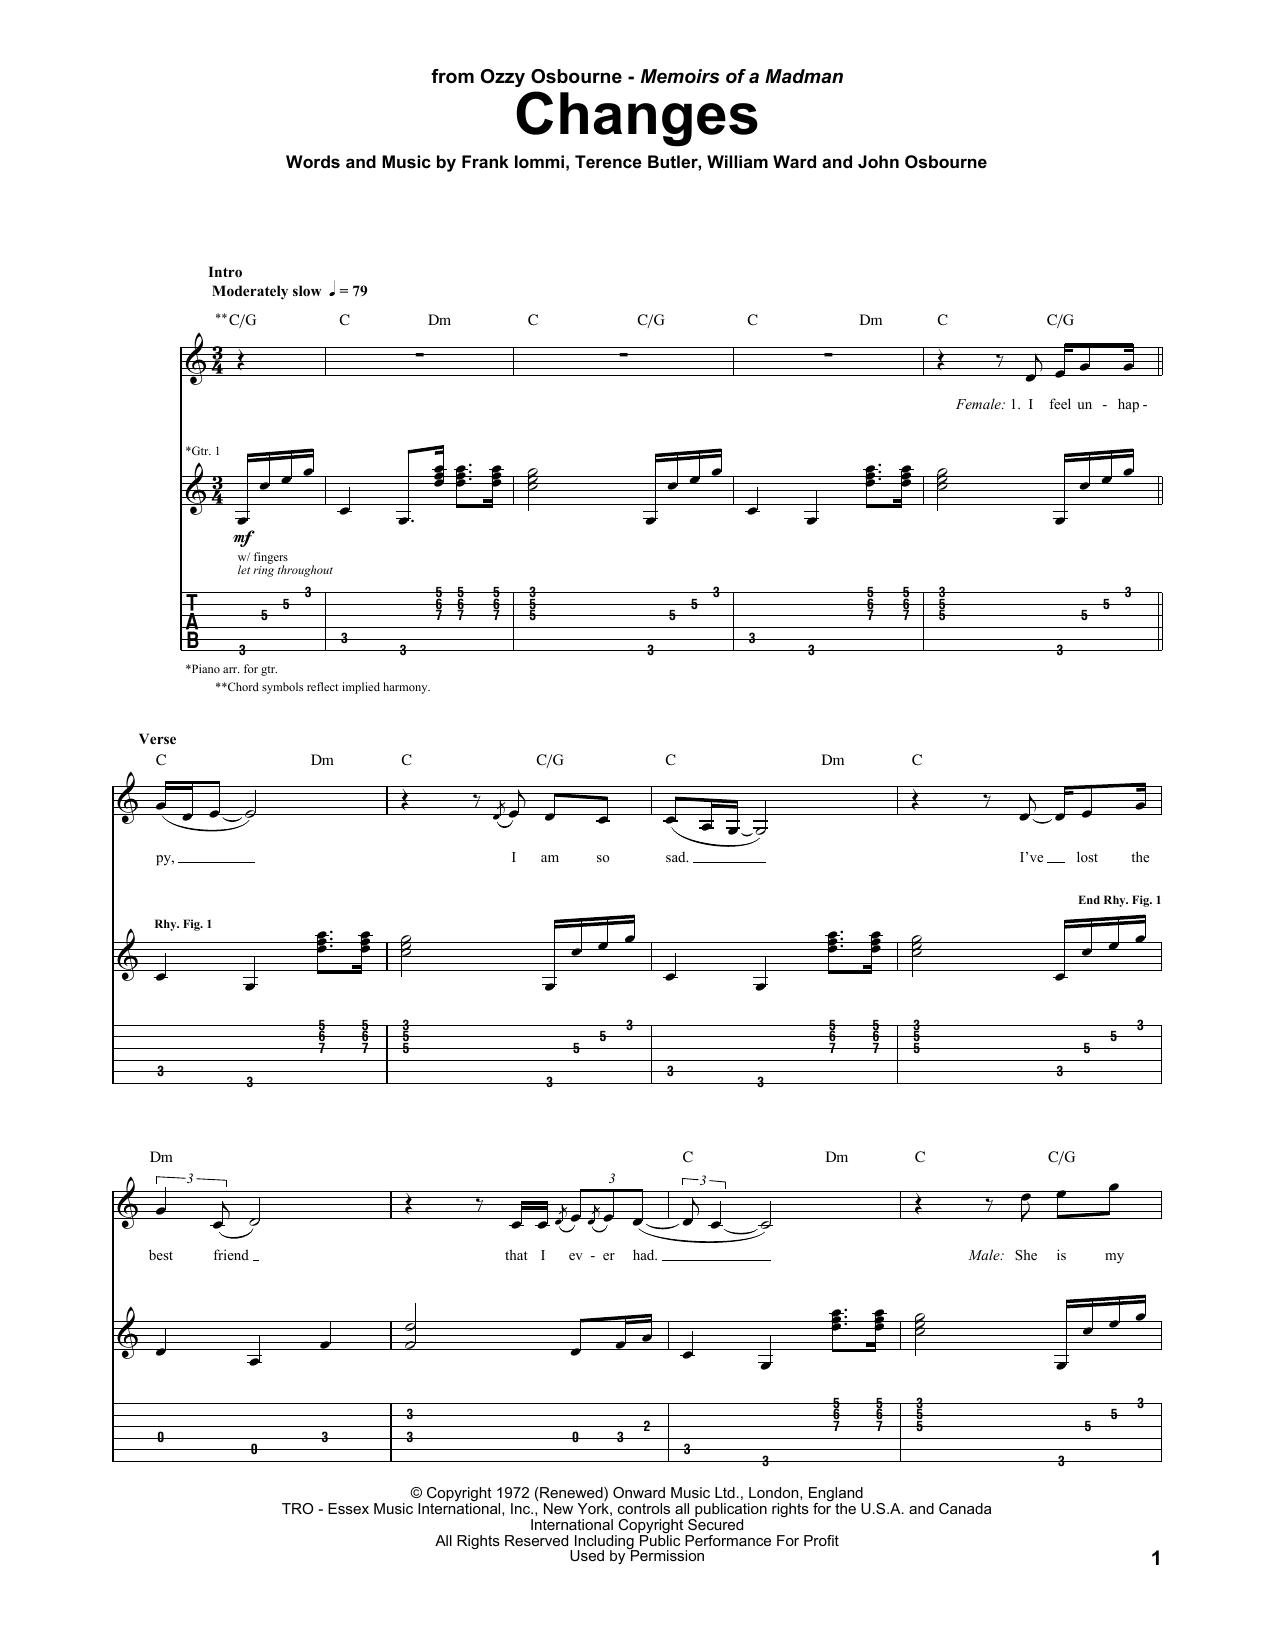 Sheet Music Digital Files To Print Licensed William Ward Digital